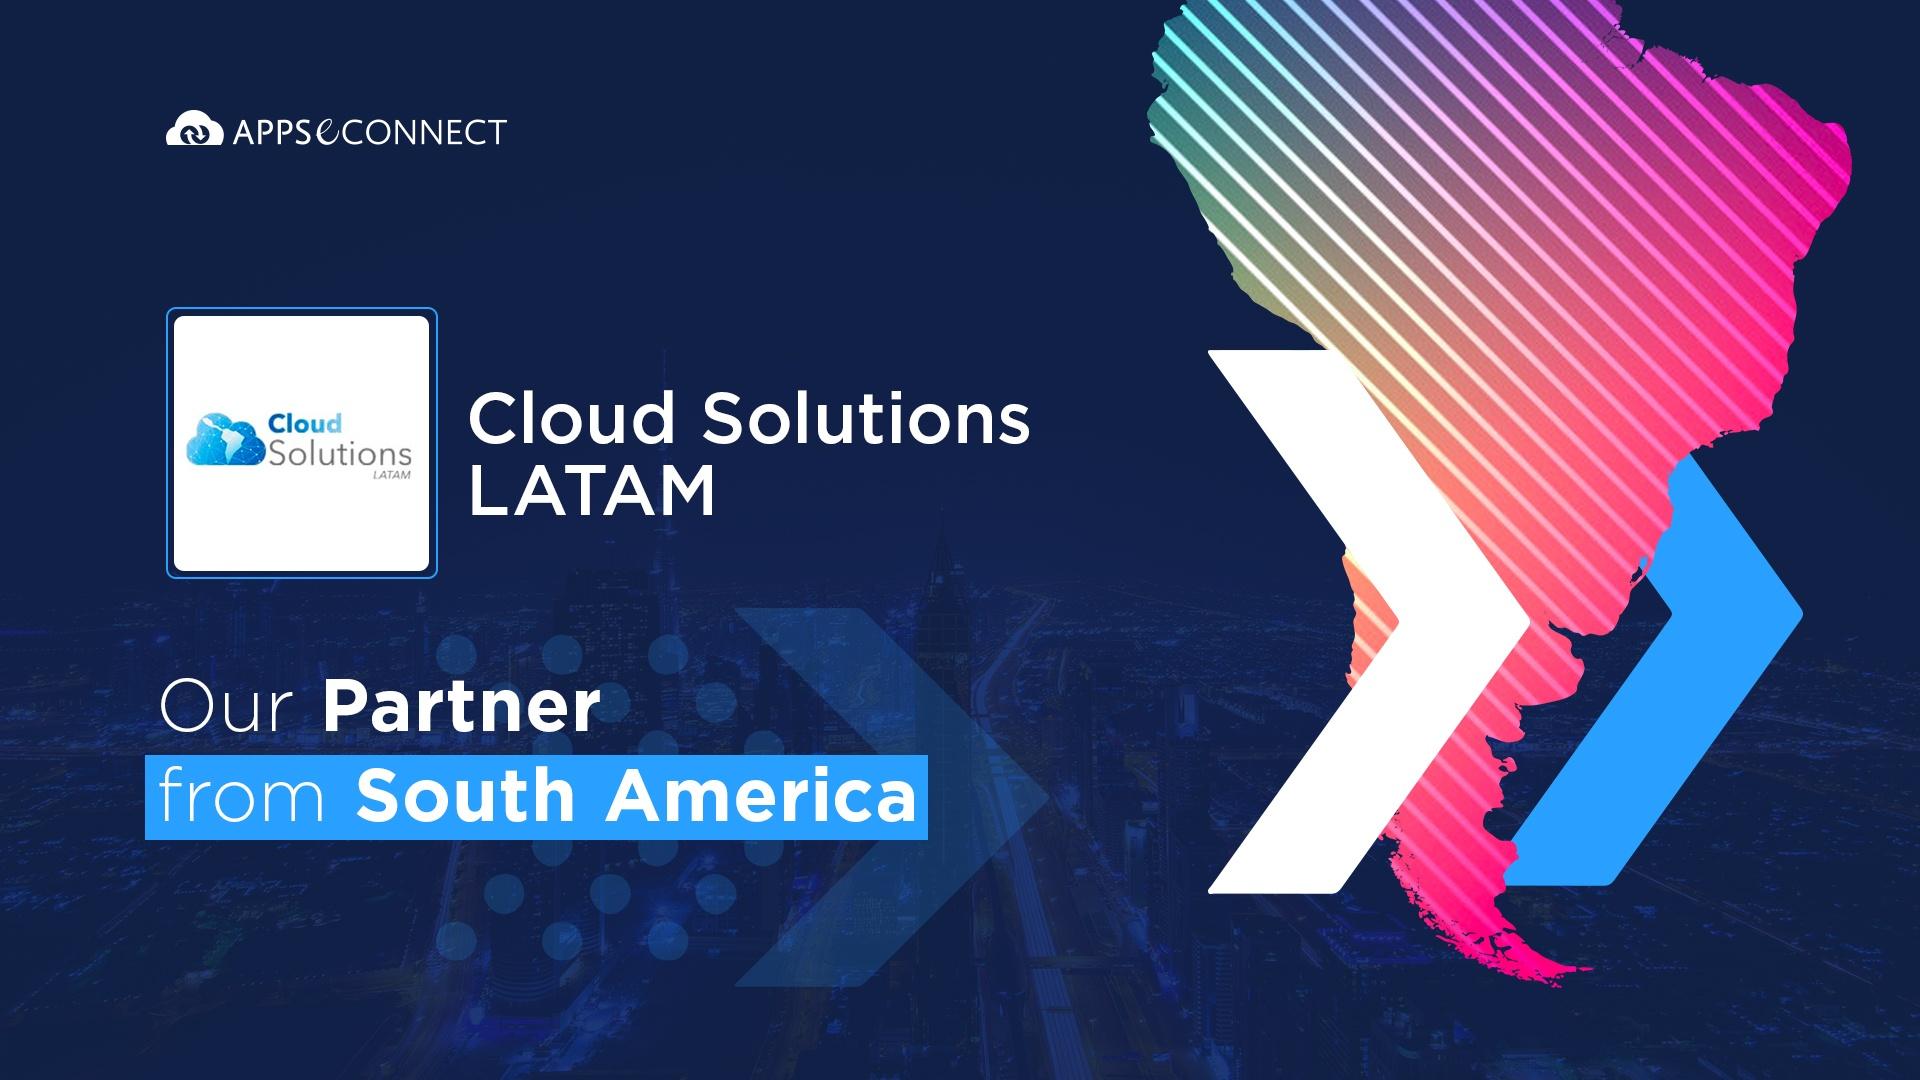 Cloud-Solutions-LATAM-partner-social-post